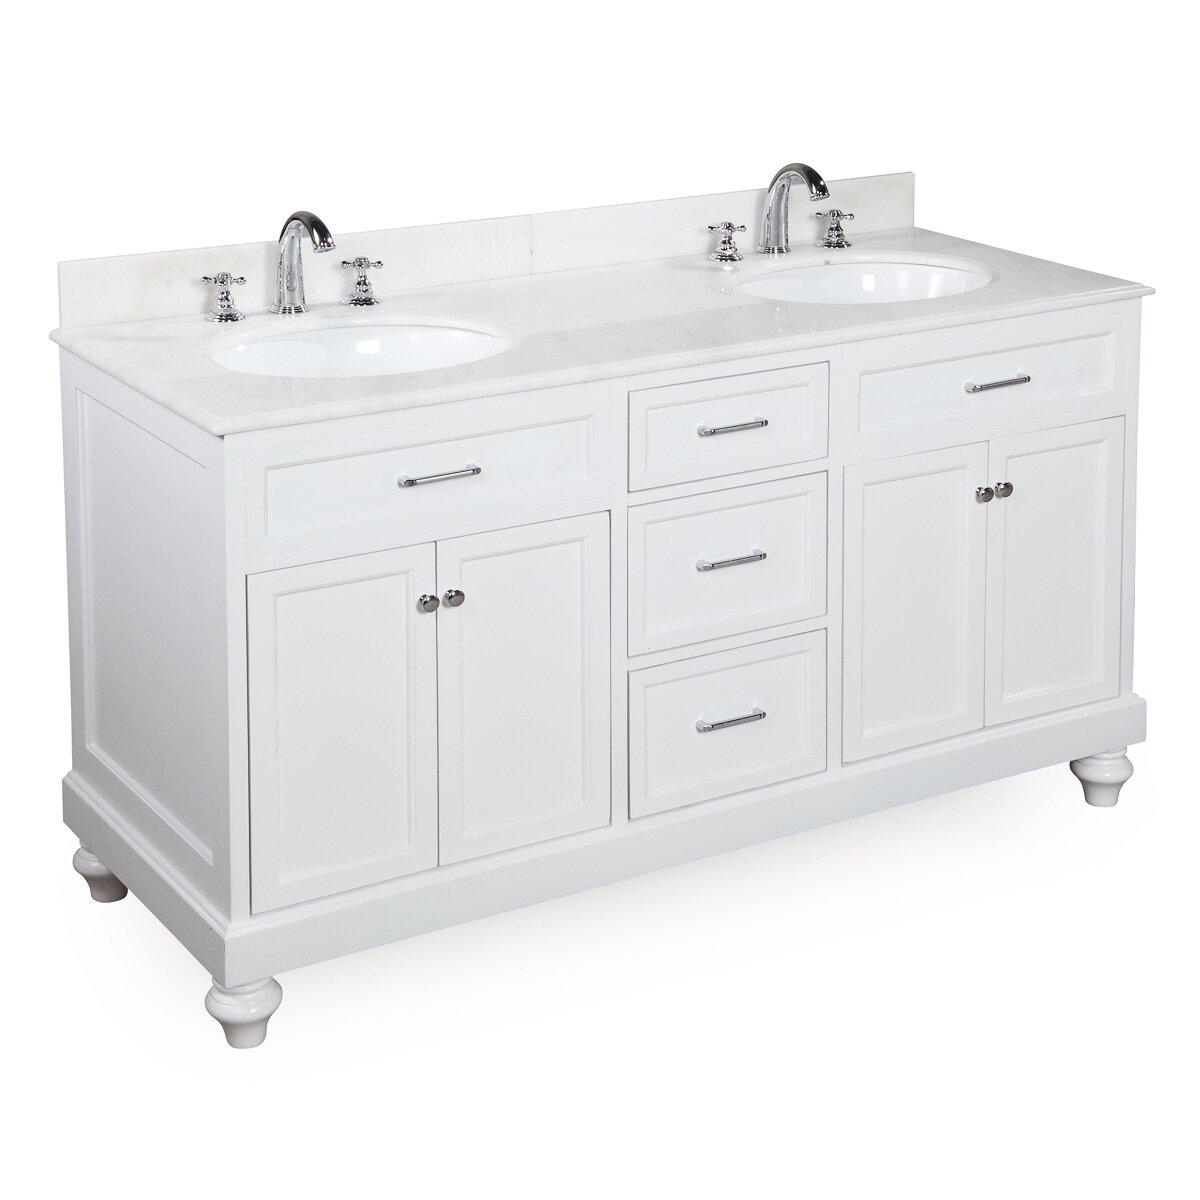 kbc amelia 60 double bathroom vanity set reviews wayfair. Black Bedroom Furniture Sets. Home Design Ideas